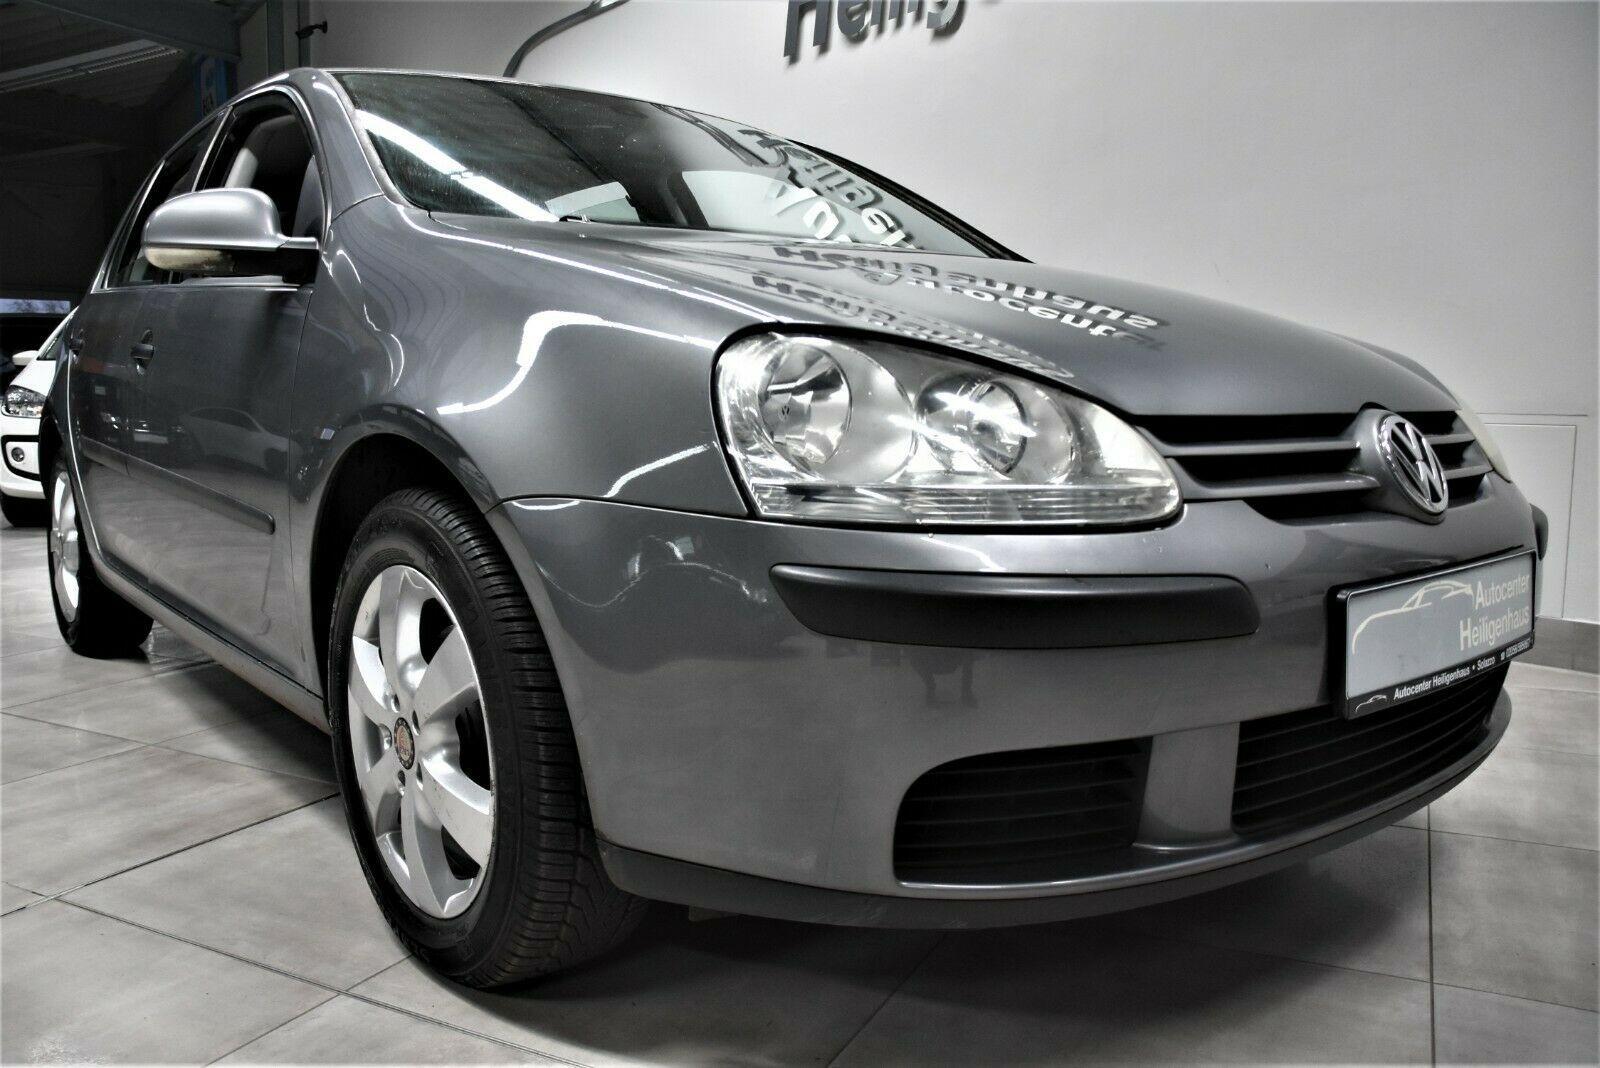 VW Golf V 1.4 Lim. Trendline Klimaautom.*88.512 Km*